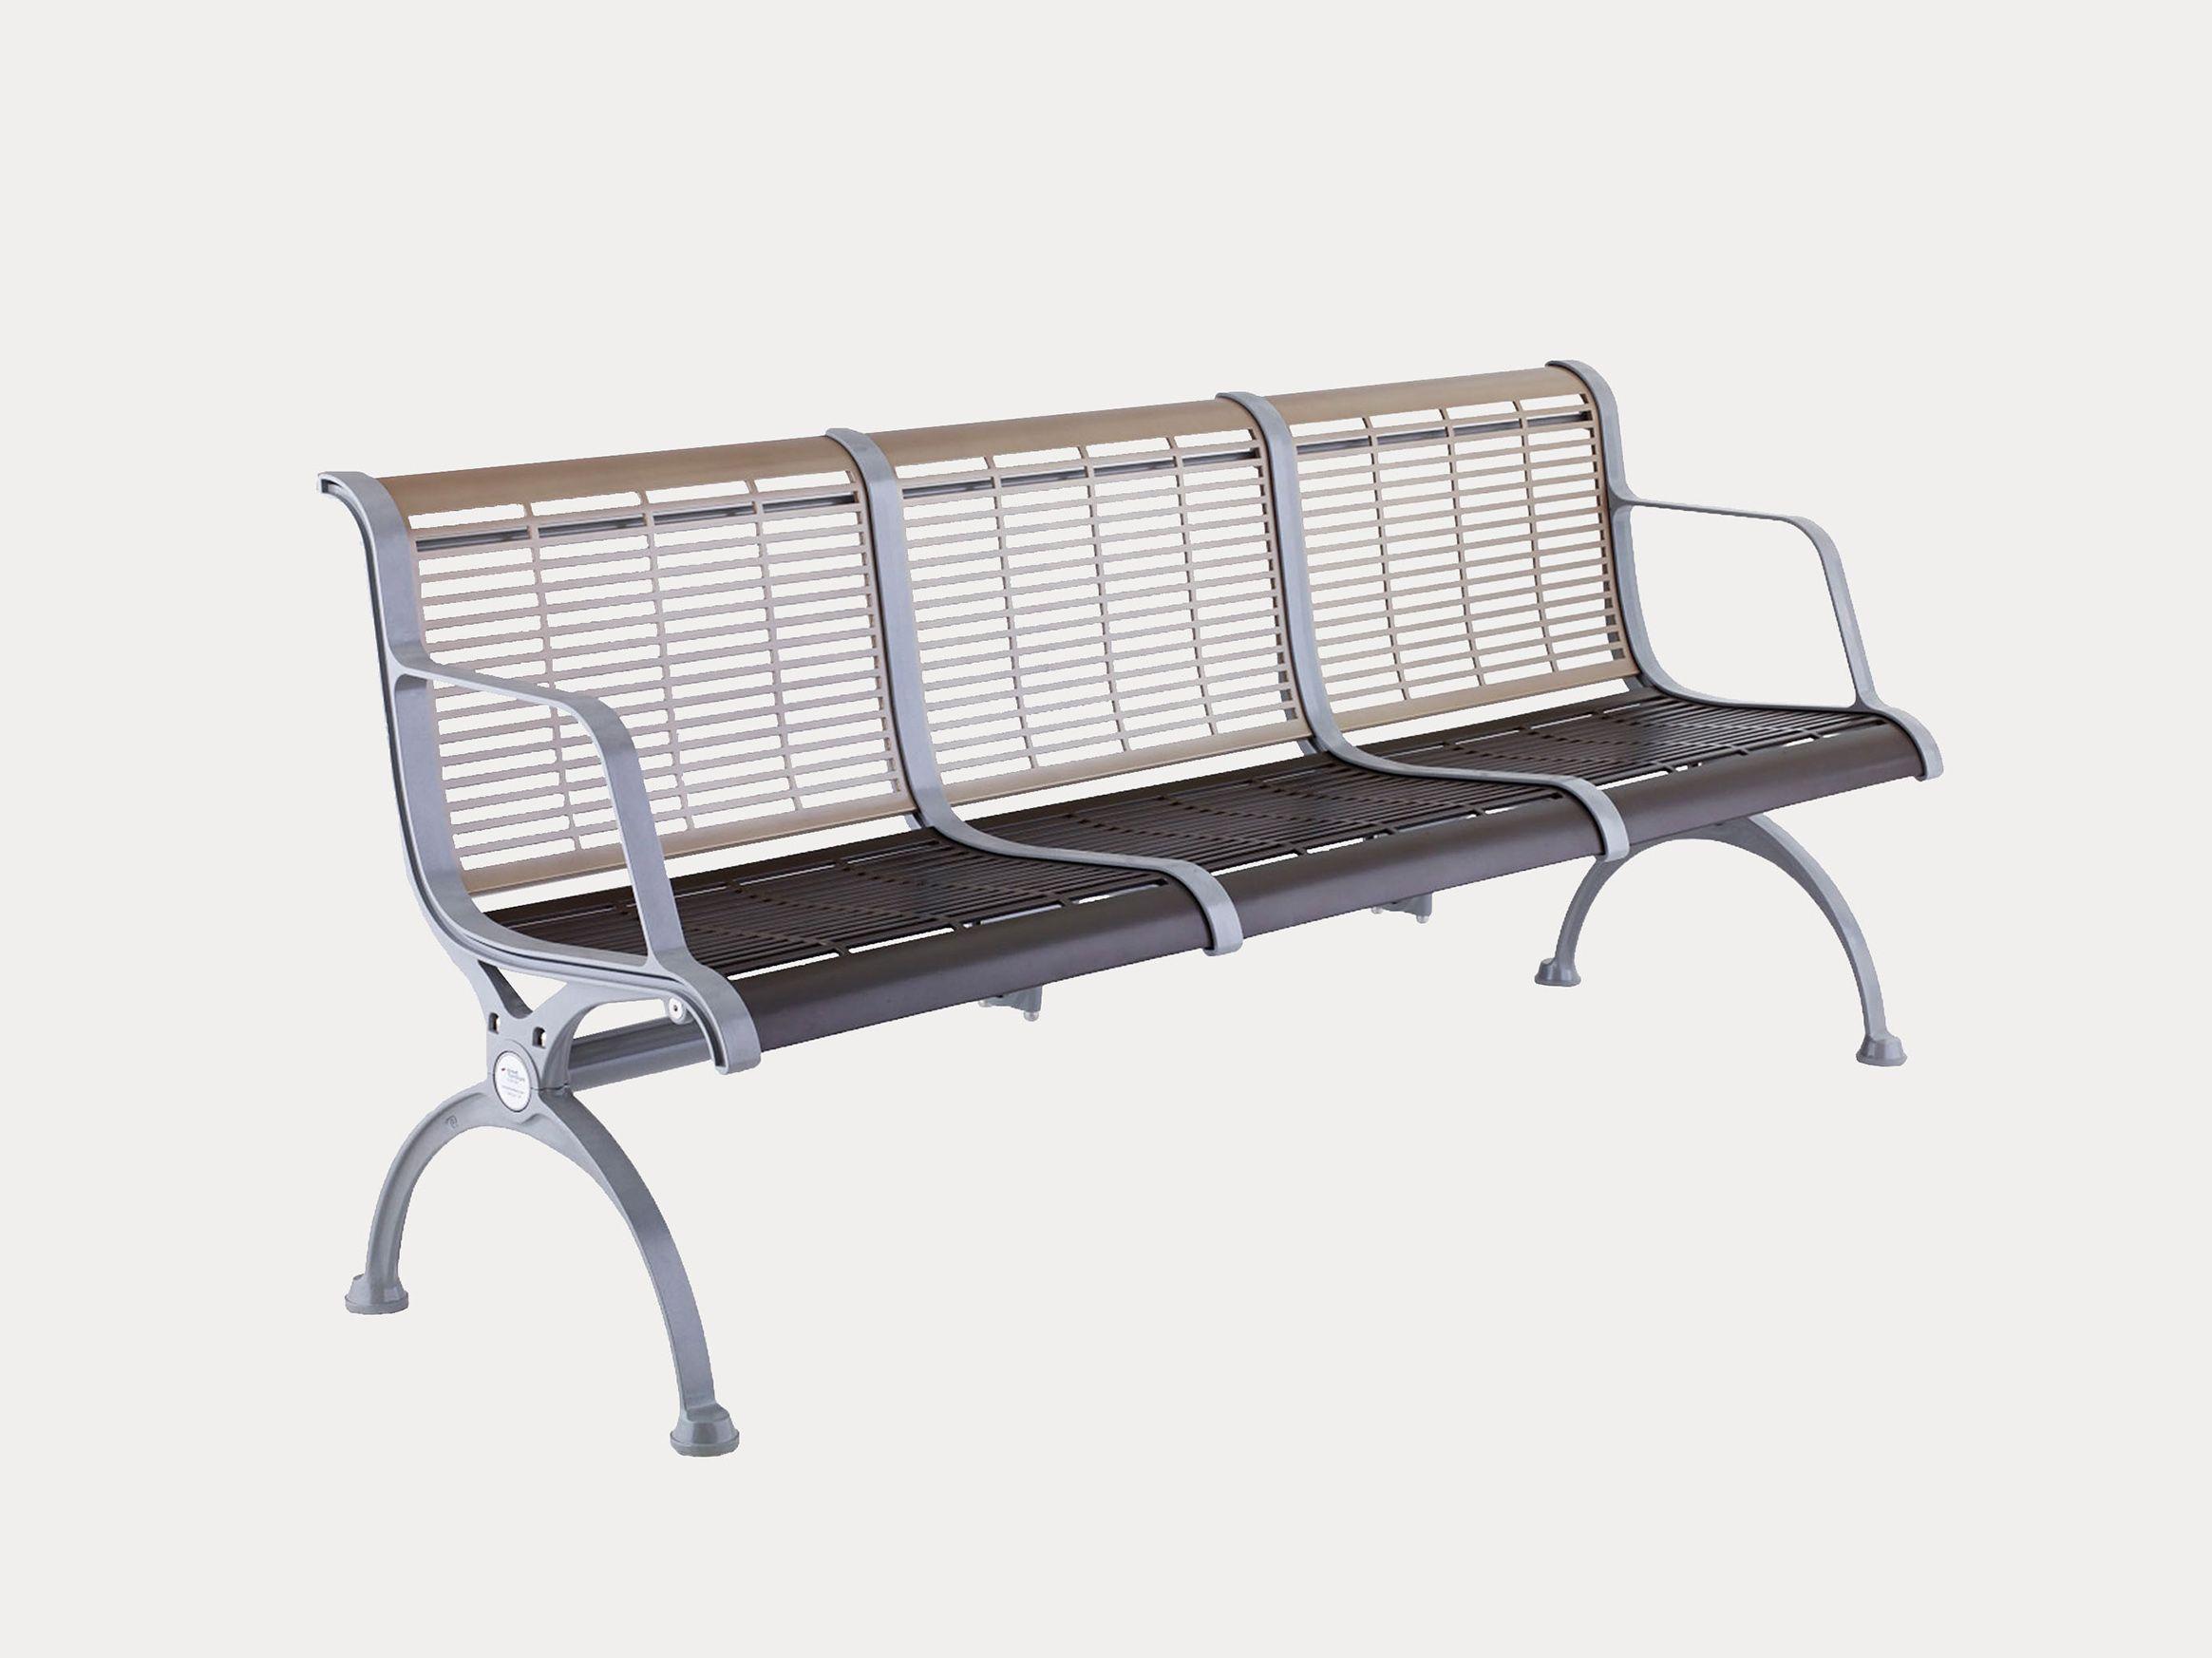 Tremendous Concourse Seat Street Furniture Australia Machost Co Dining Chair Design Ideas Machostcouk